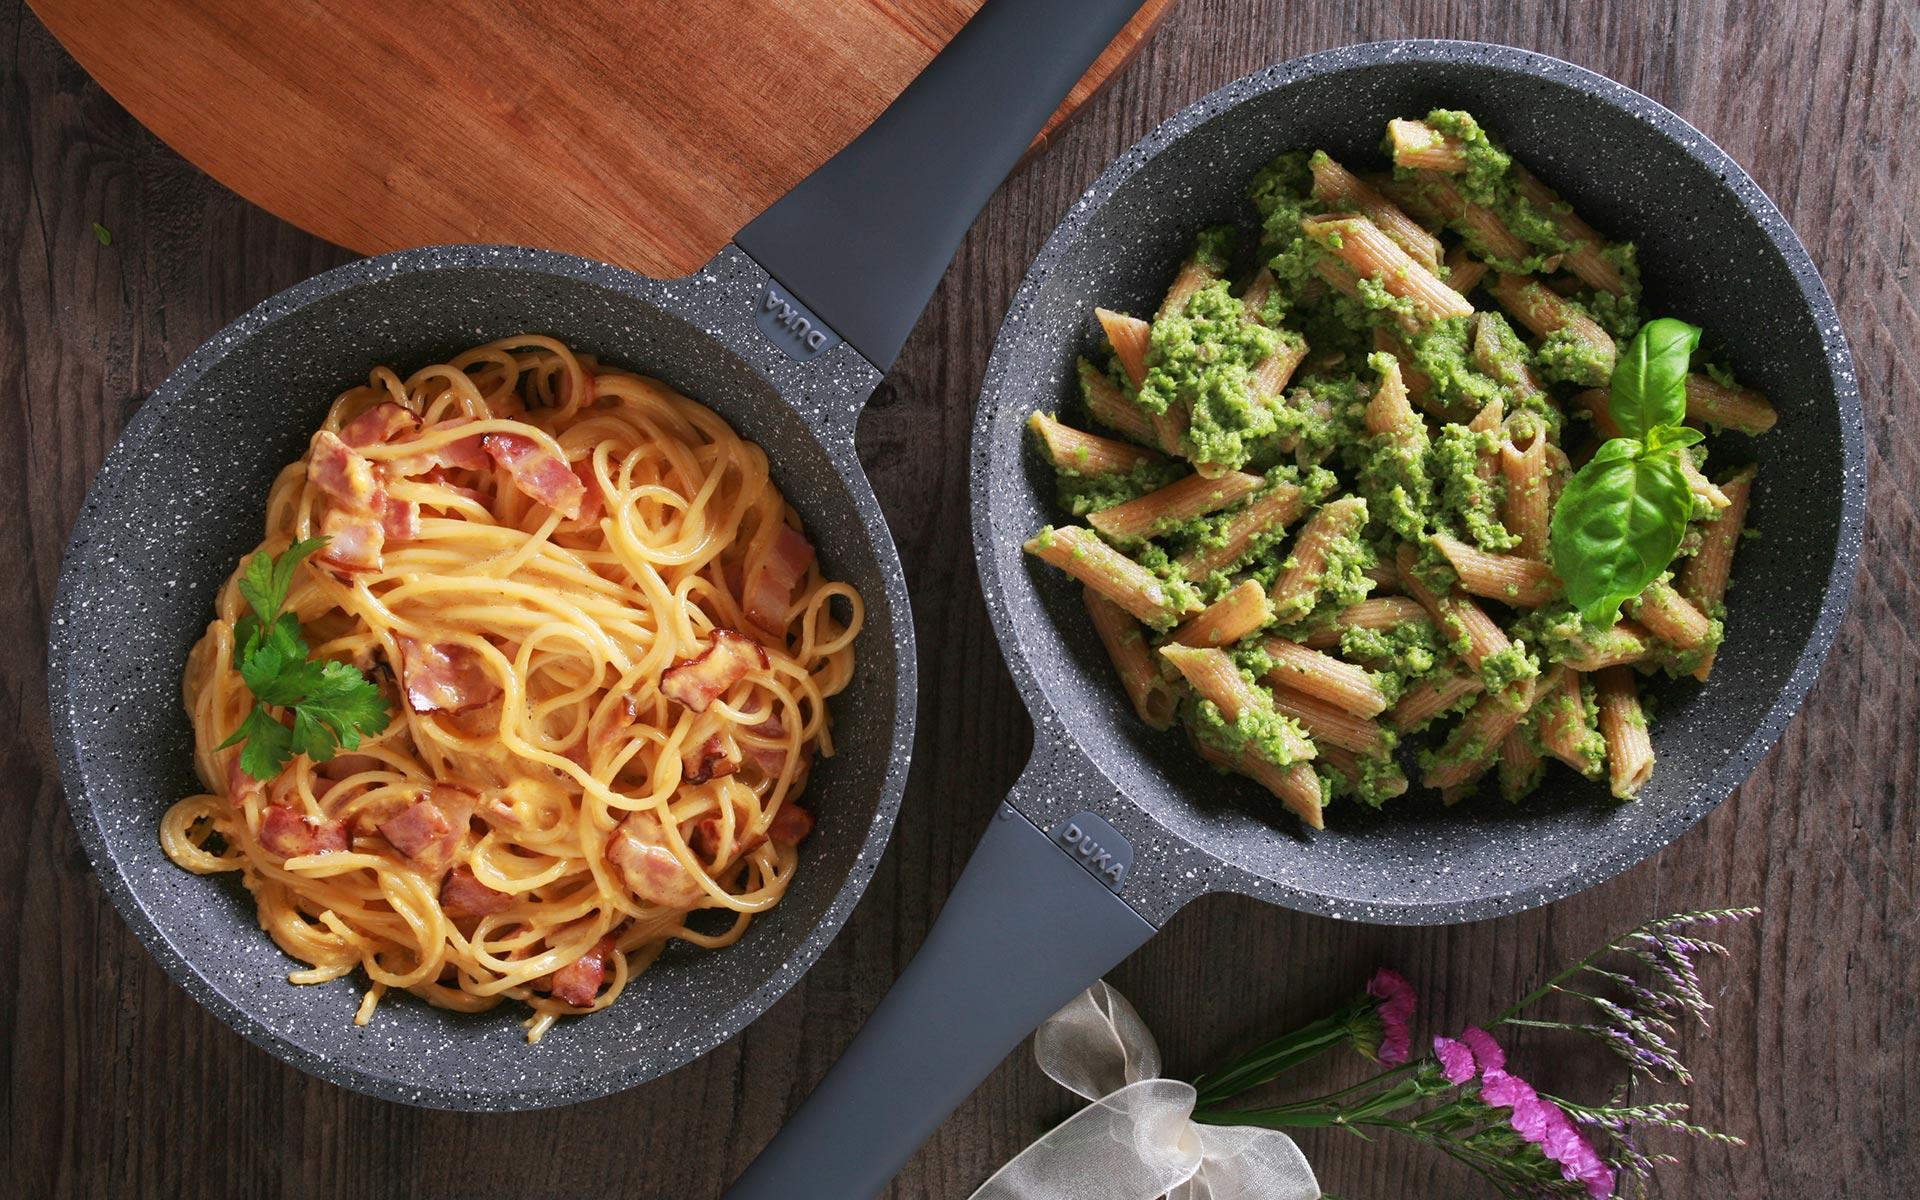 Makaron pesto z brokułów i słonecznika vs. Makaron carbonara